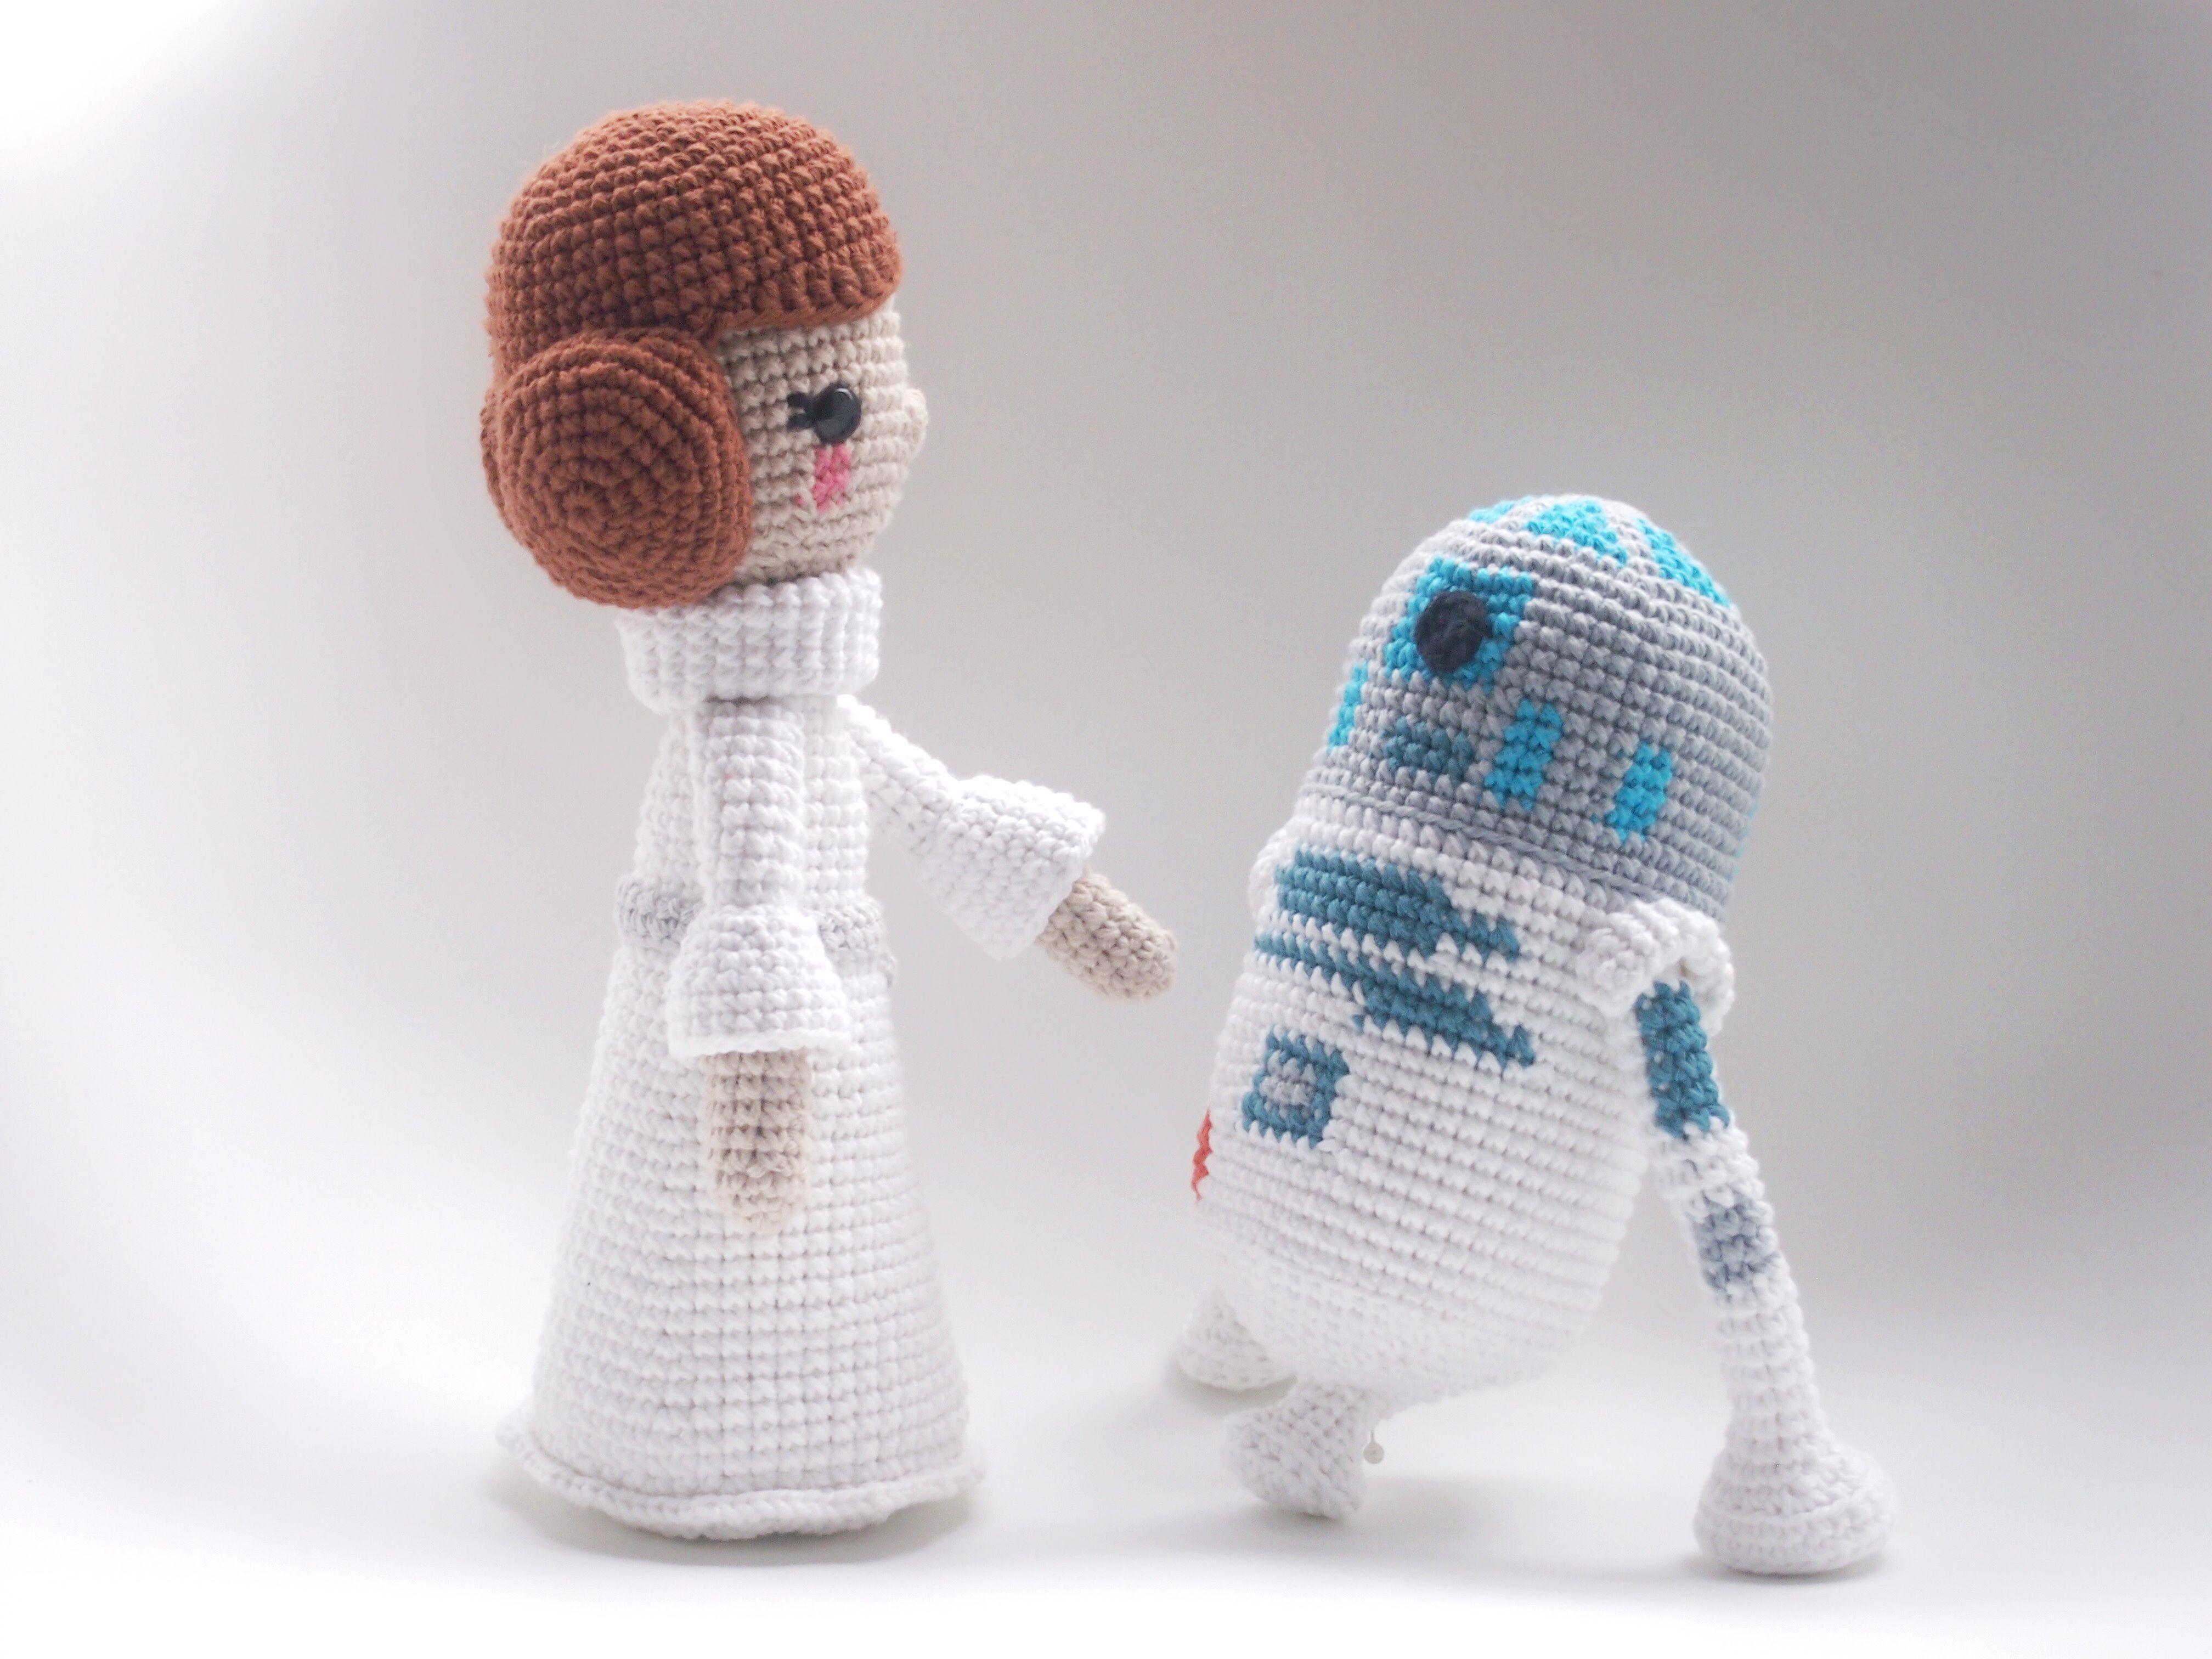 Princess Leia and R2D2 CROCHET DOLL PATTERN. | crochet | Pinterest